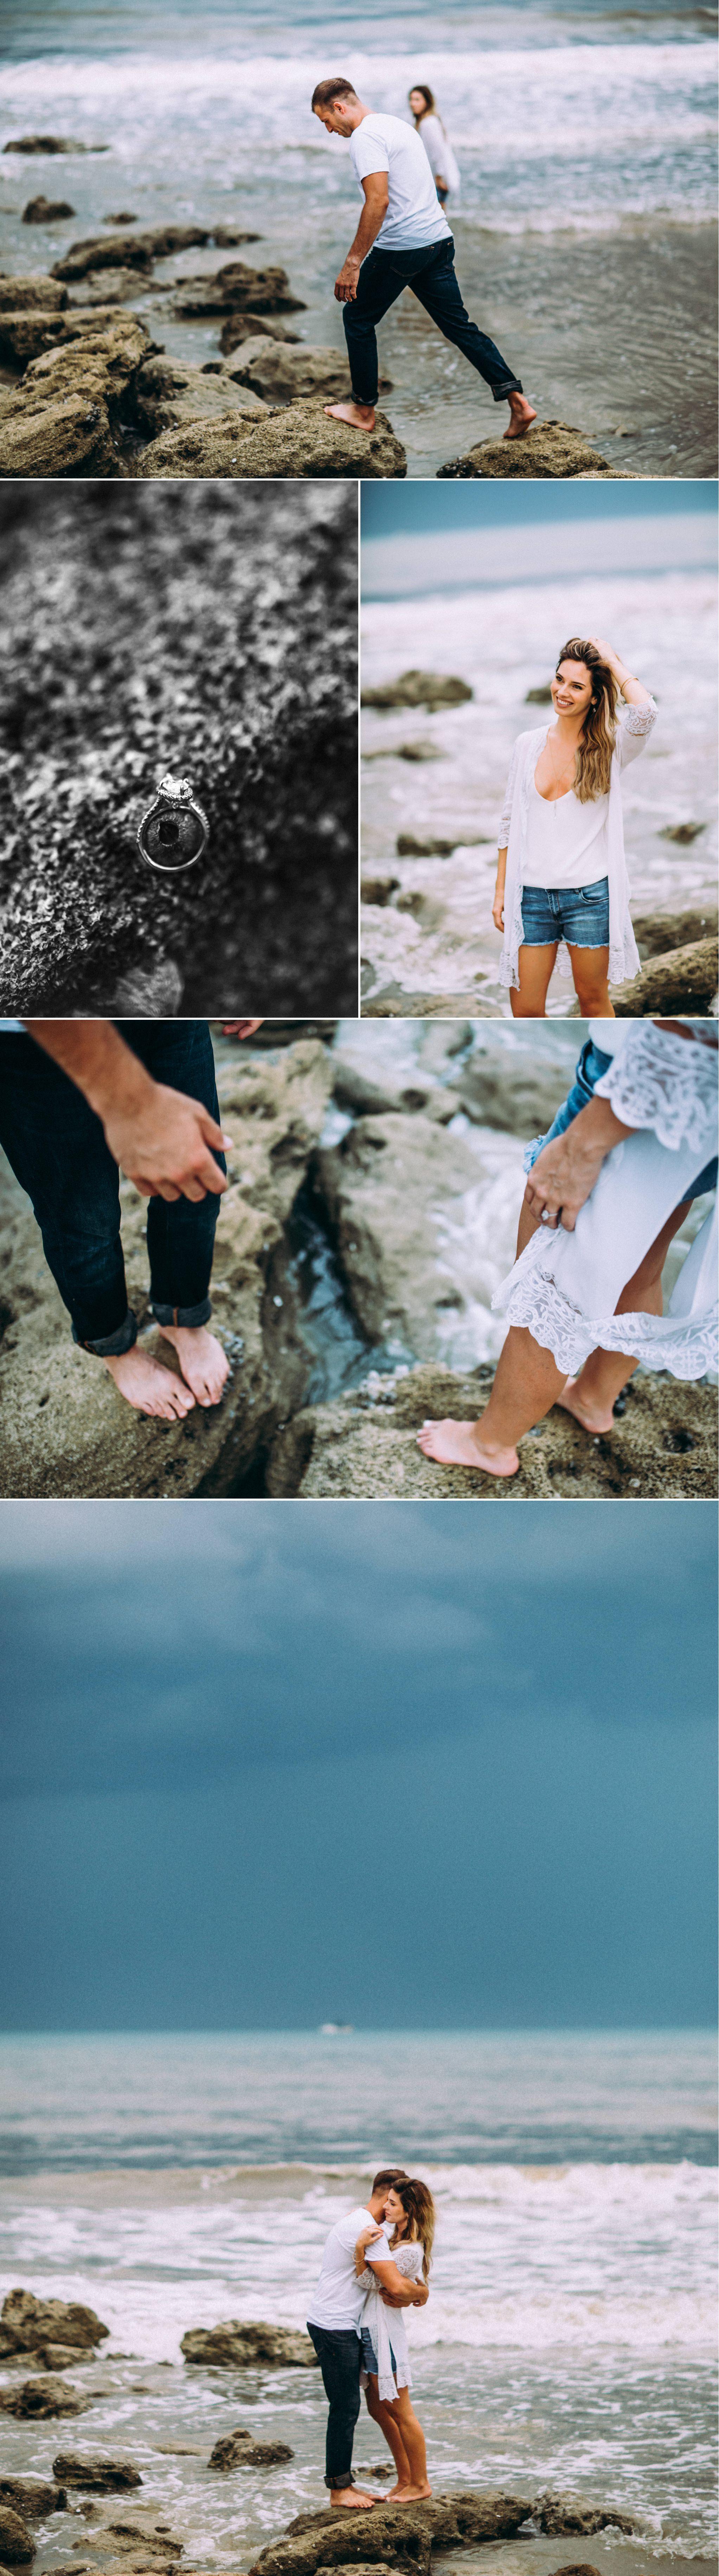 Dramatic storm skies beach boho styled engagement adventure